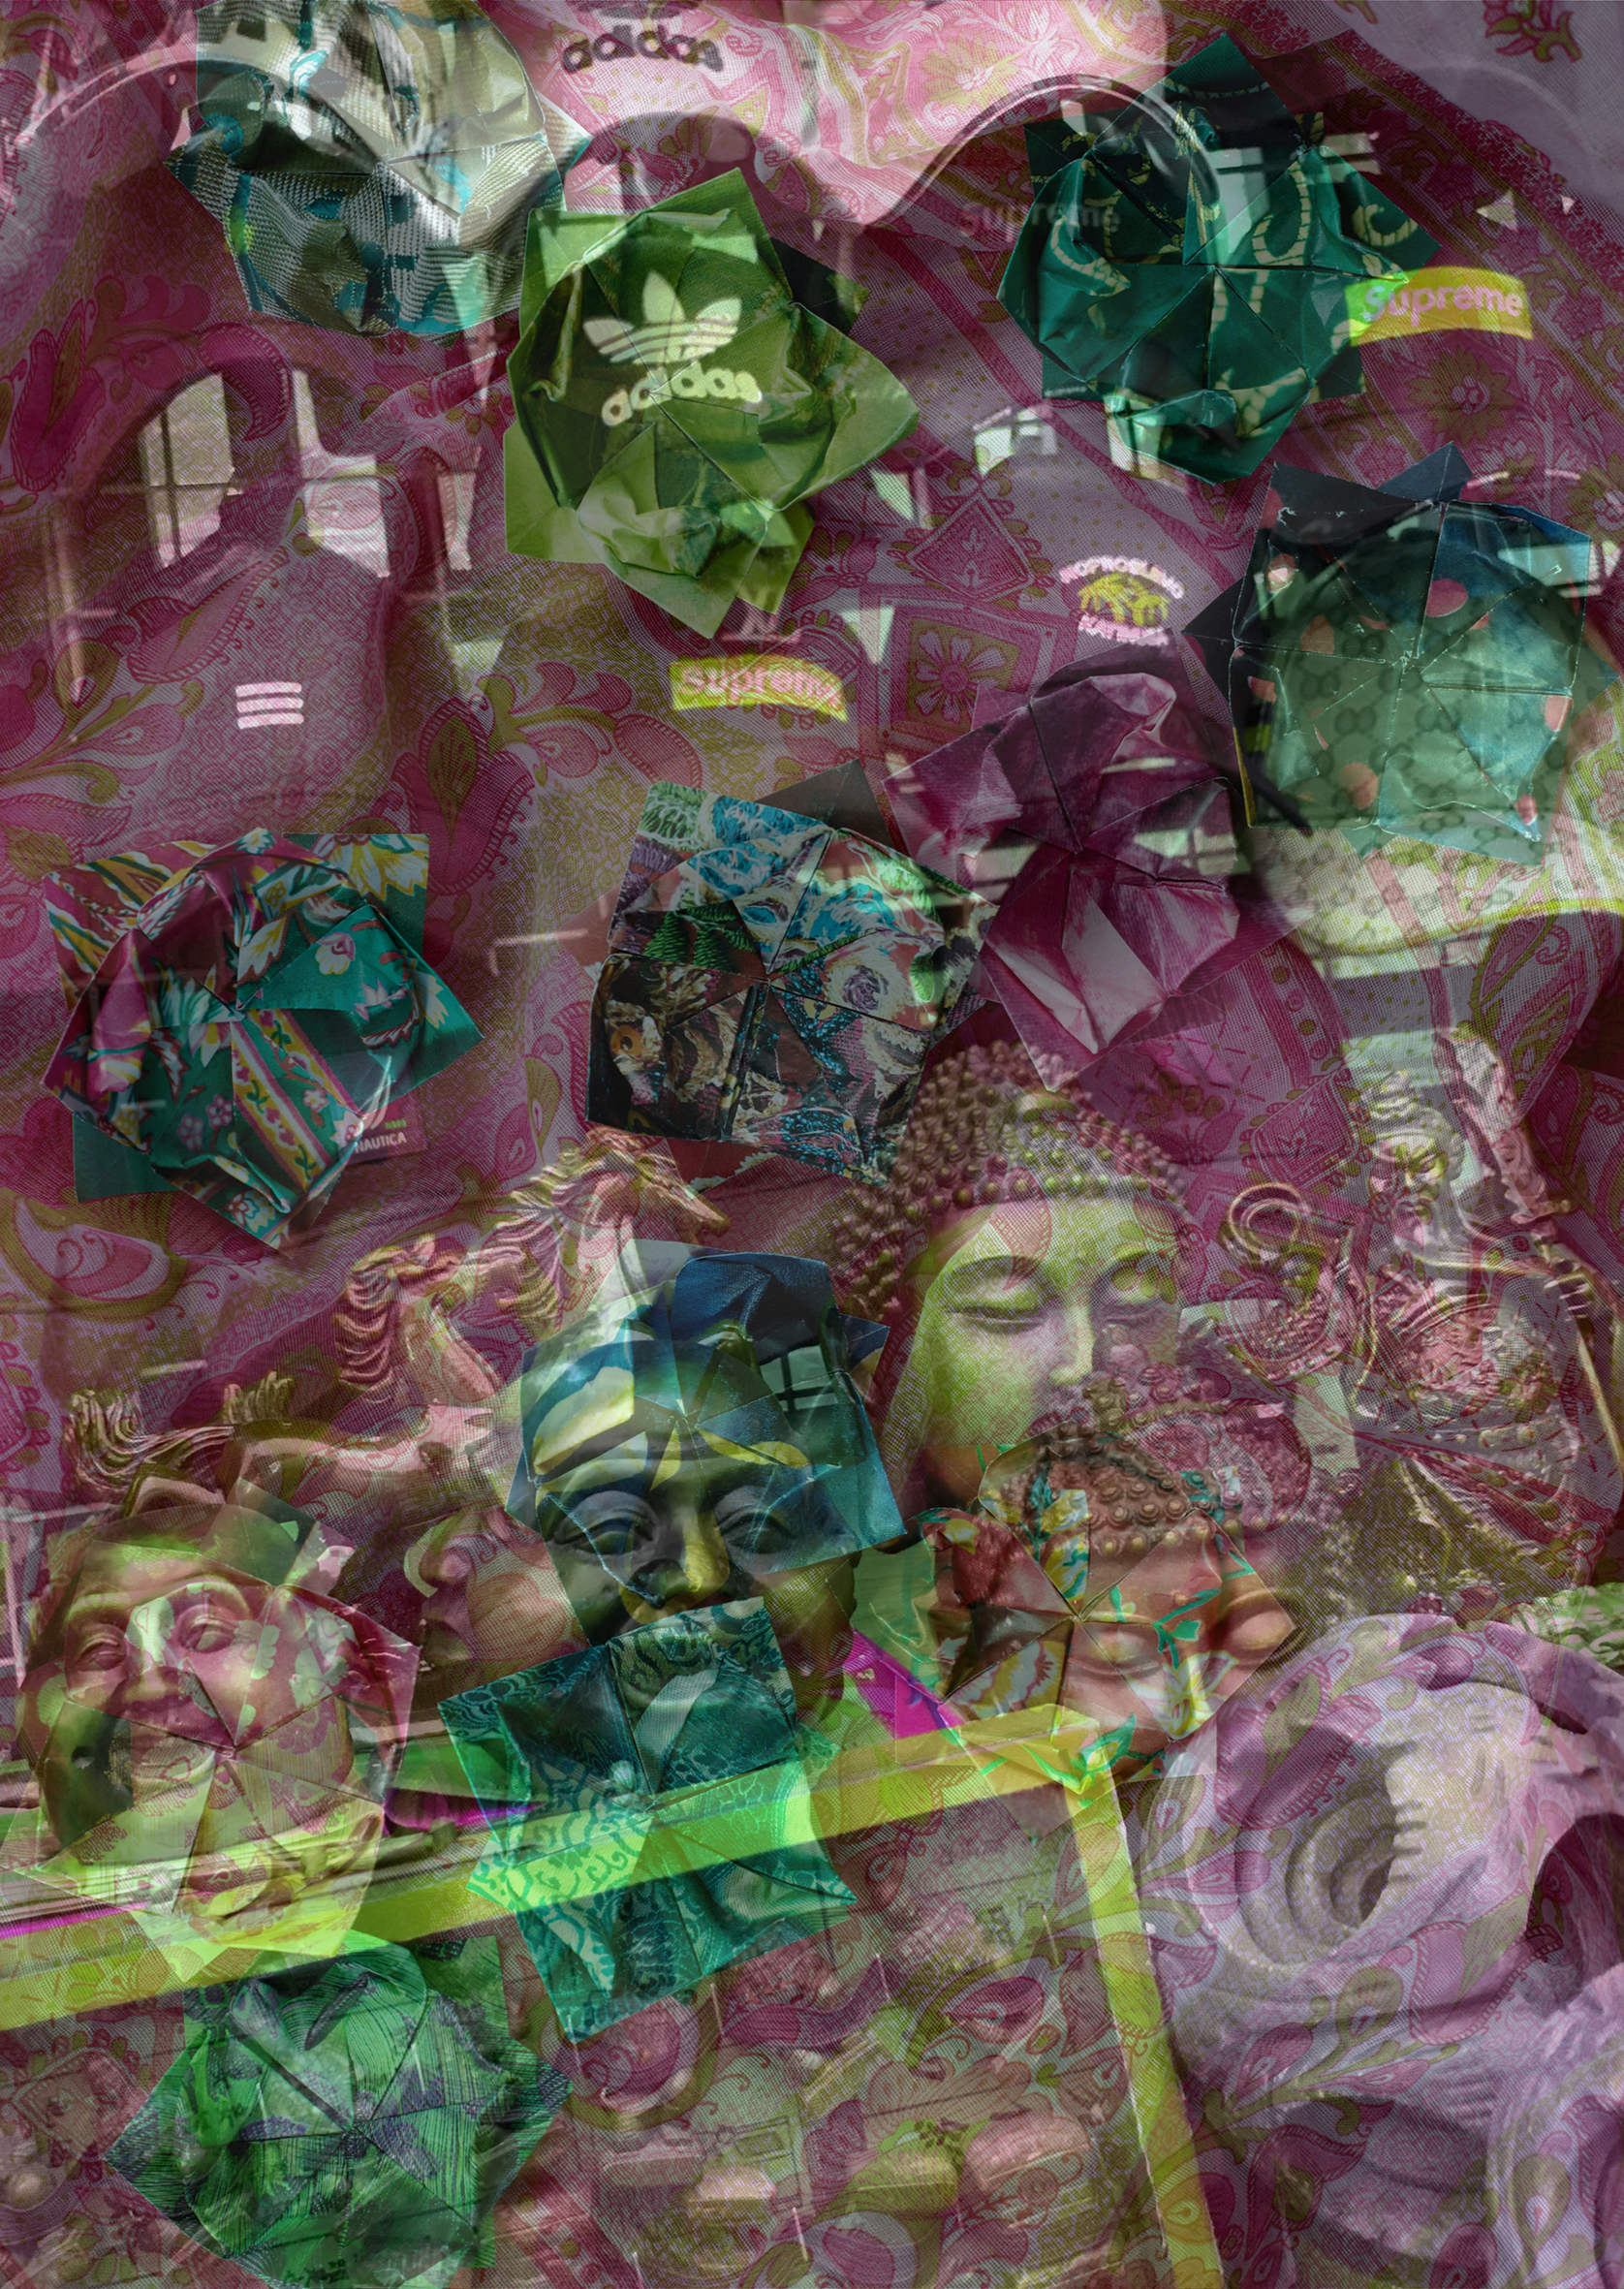 Anna Ehrenstein  ALIL 09 2019 Lenticular print 15 x 10 cm Edition of 3